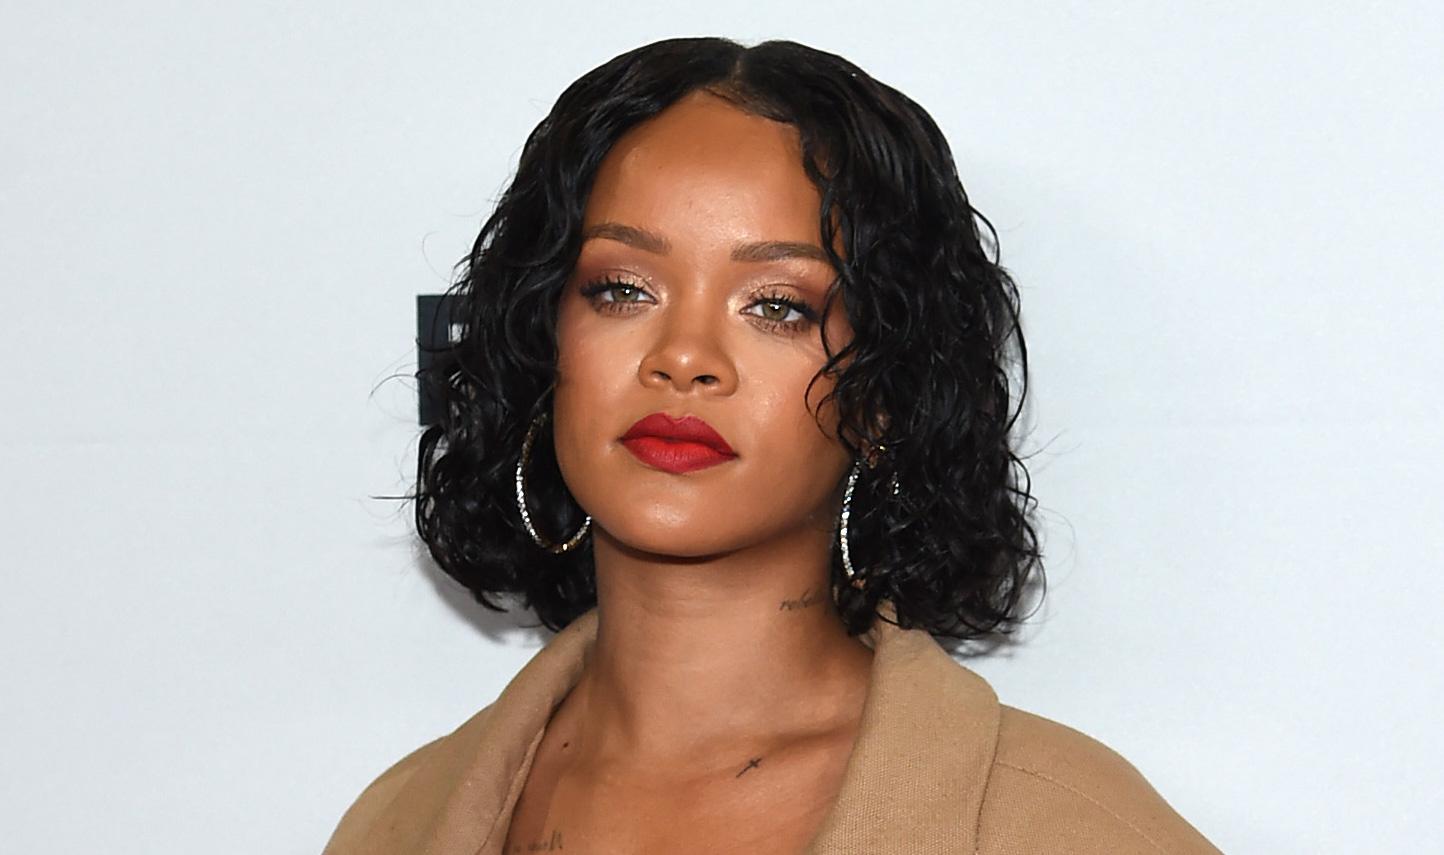 Rihanna, Yasiel Puig Burglar Also Connected to Chief Keef ...